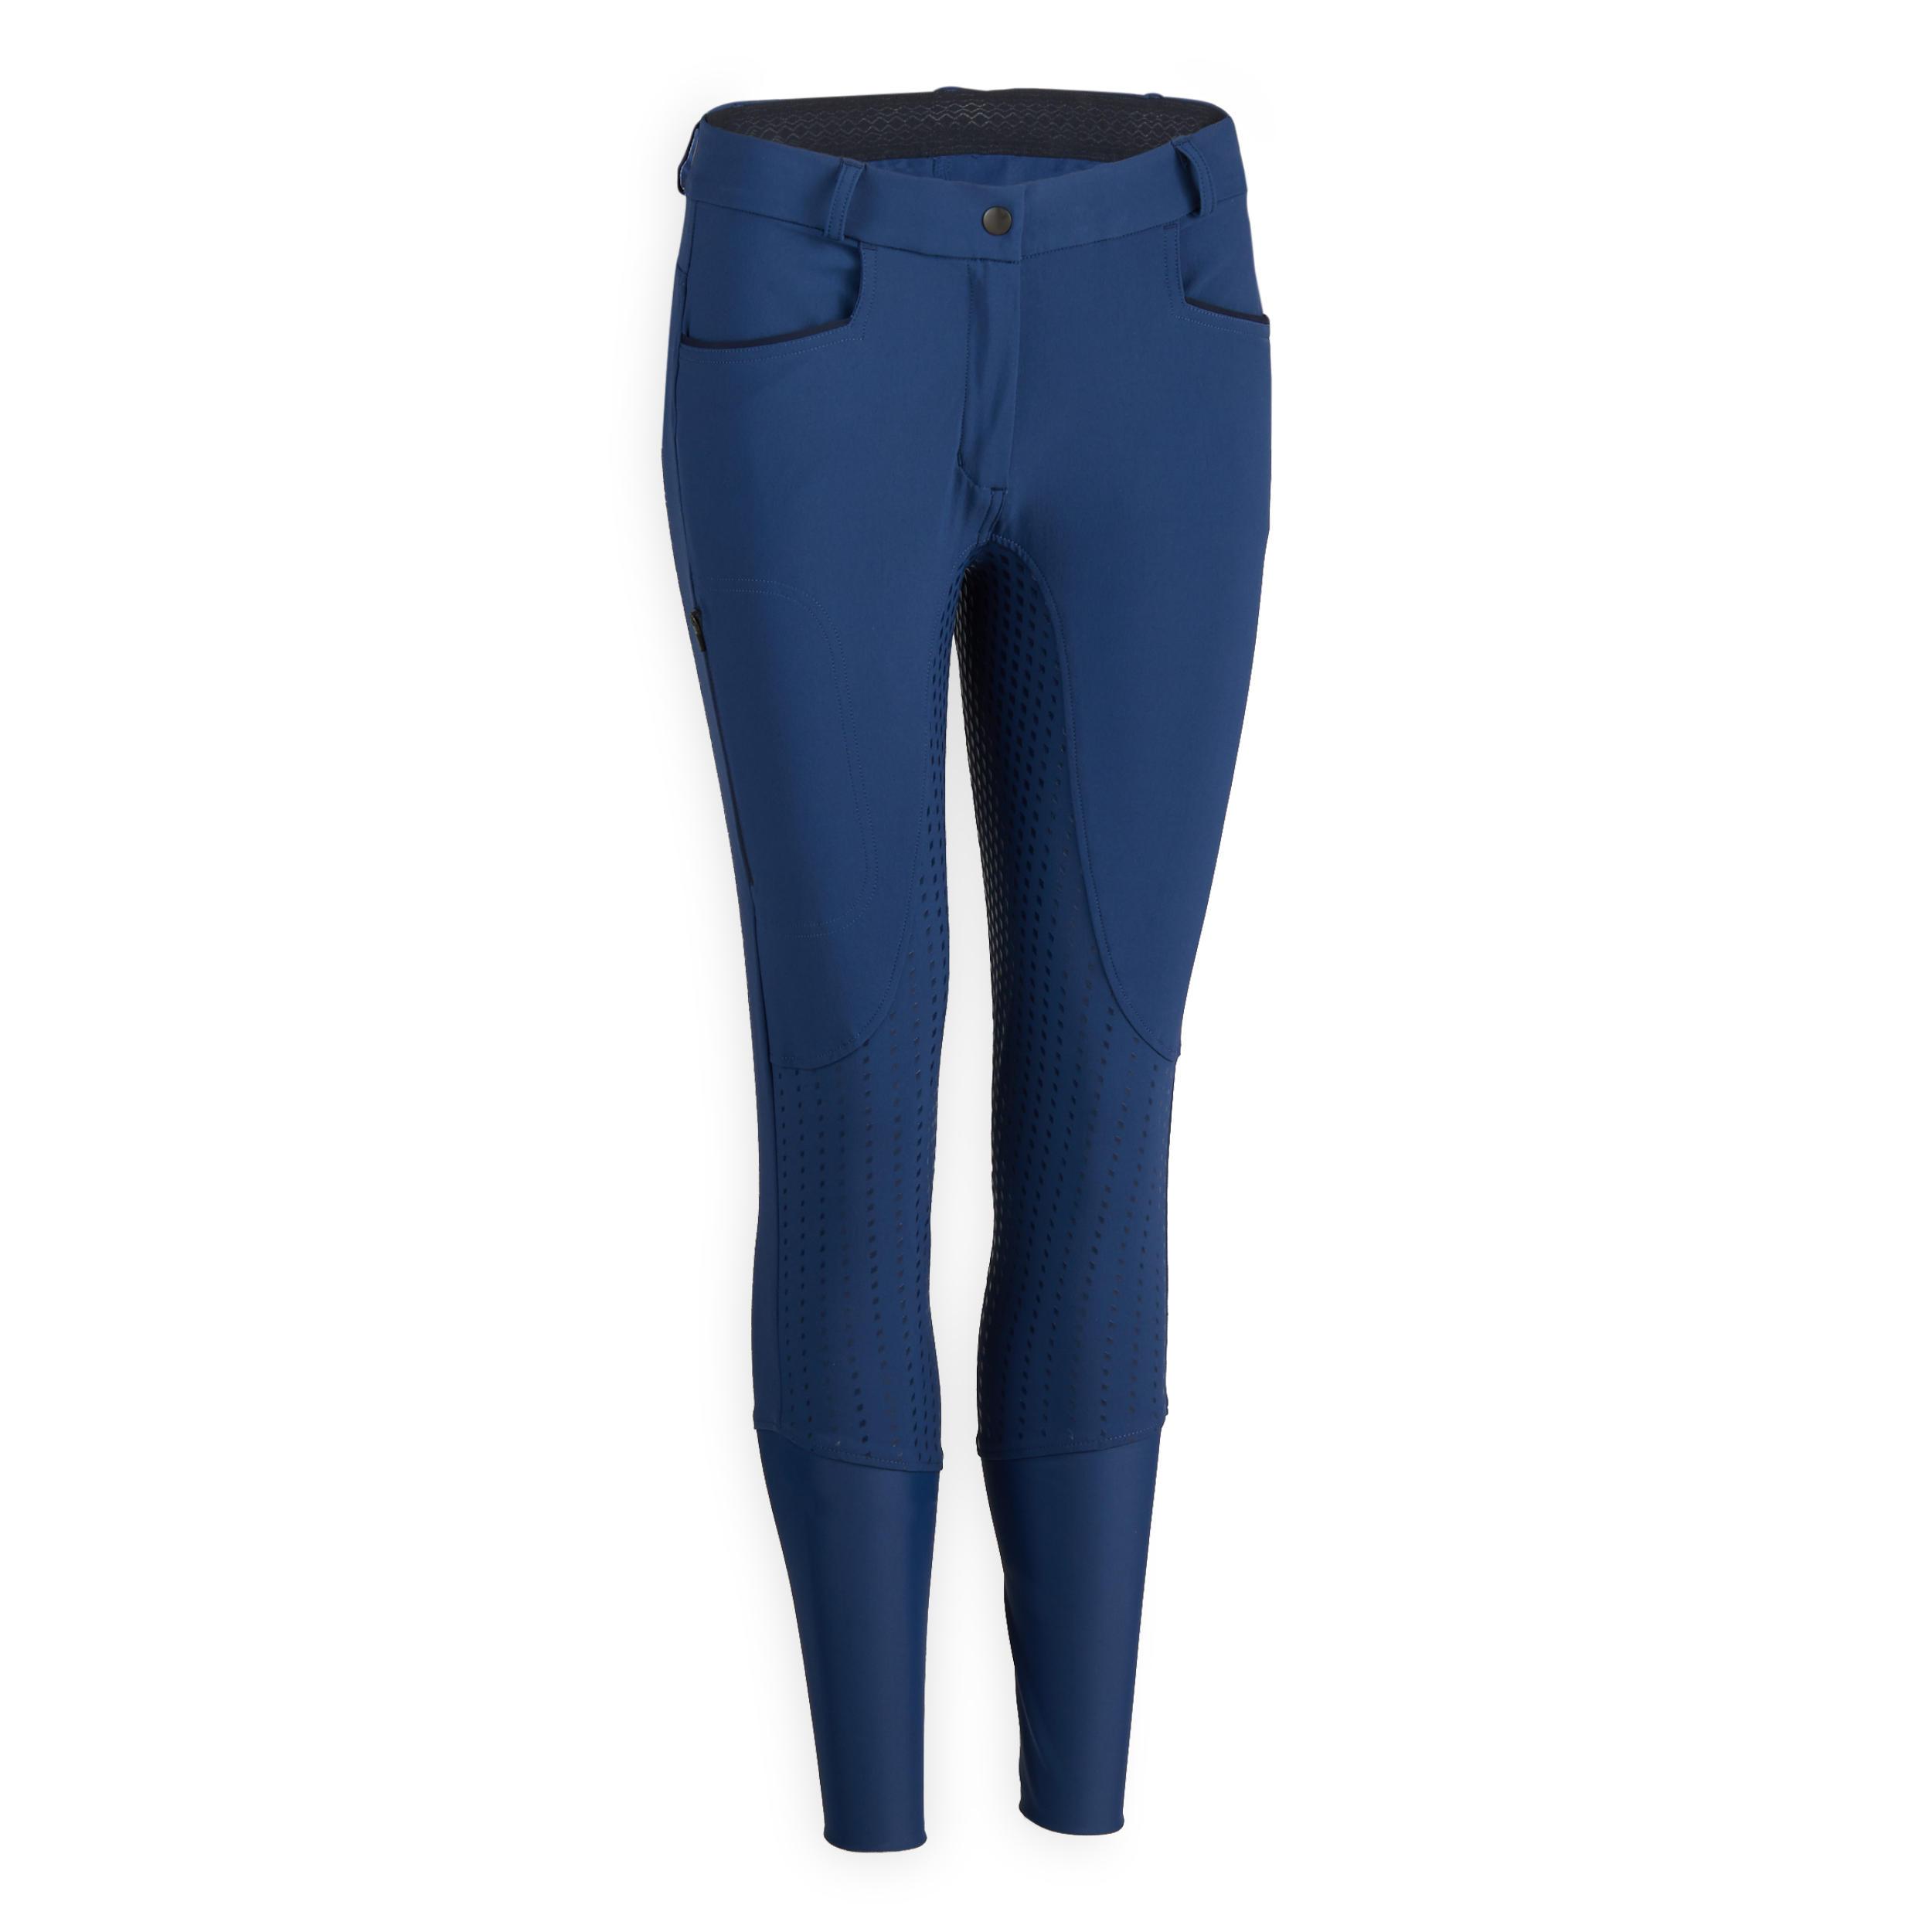 Pantalon 580 FULLGRIP Damă imagine